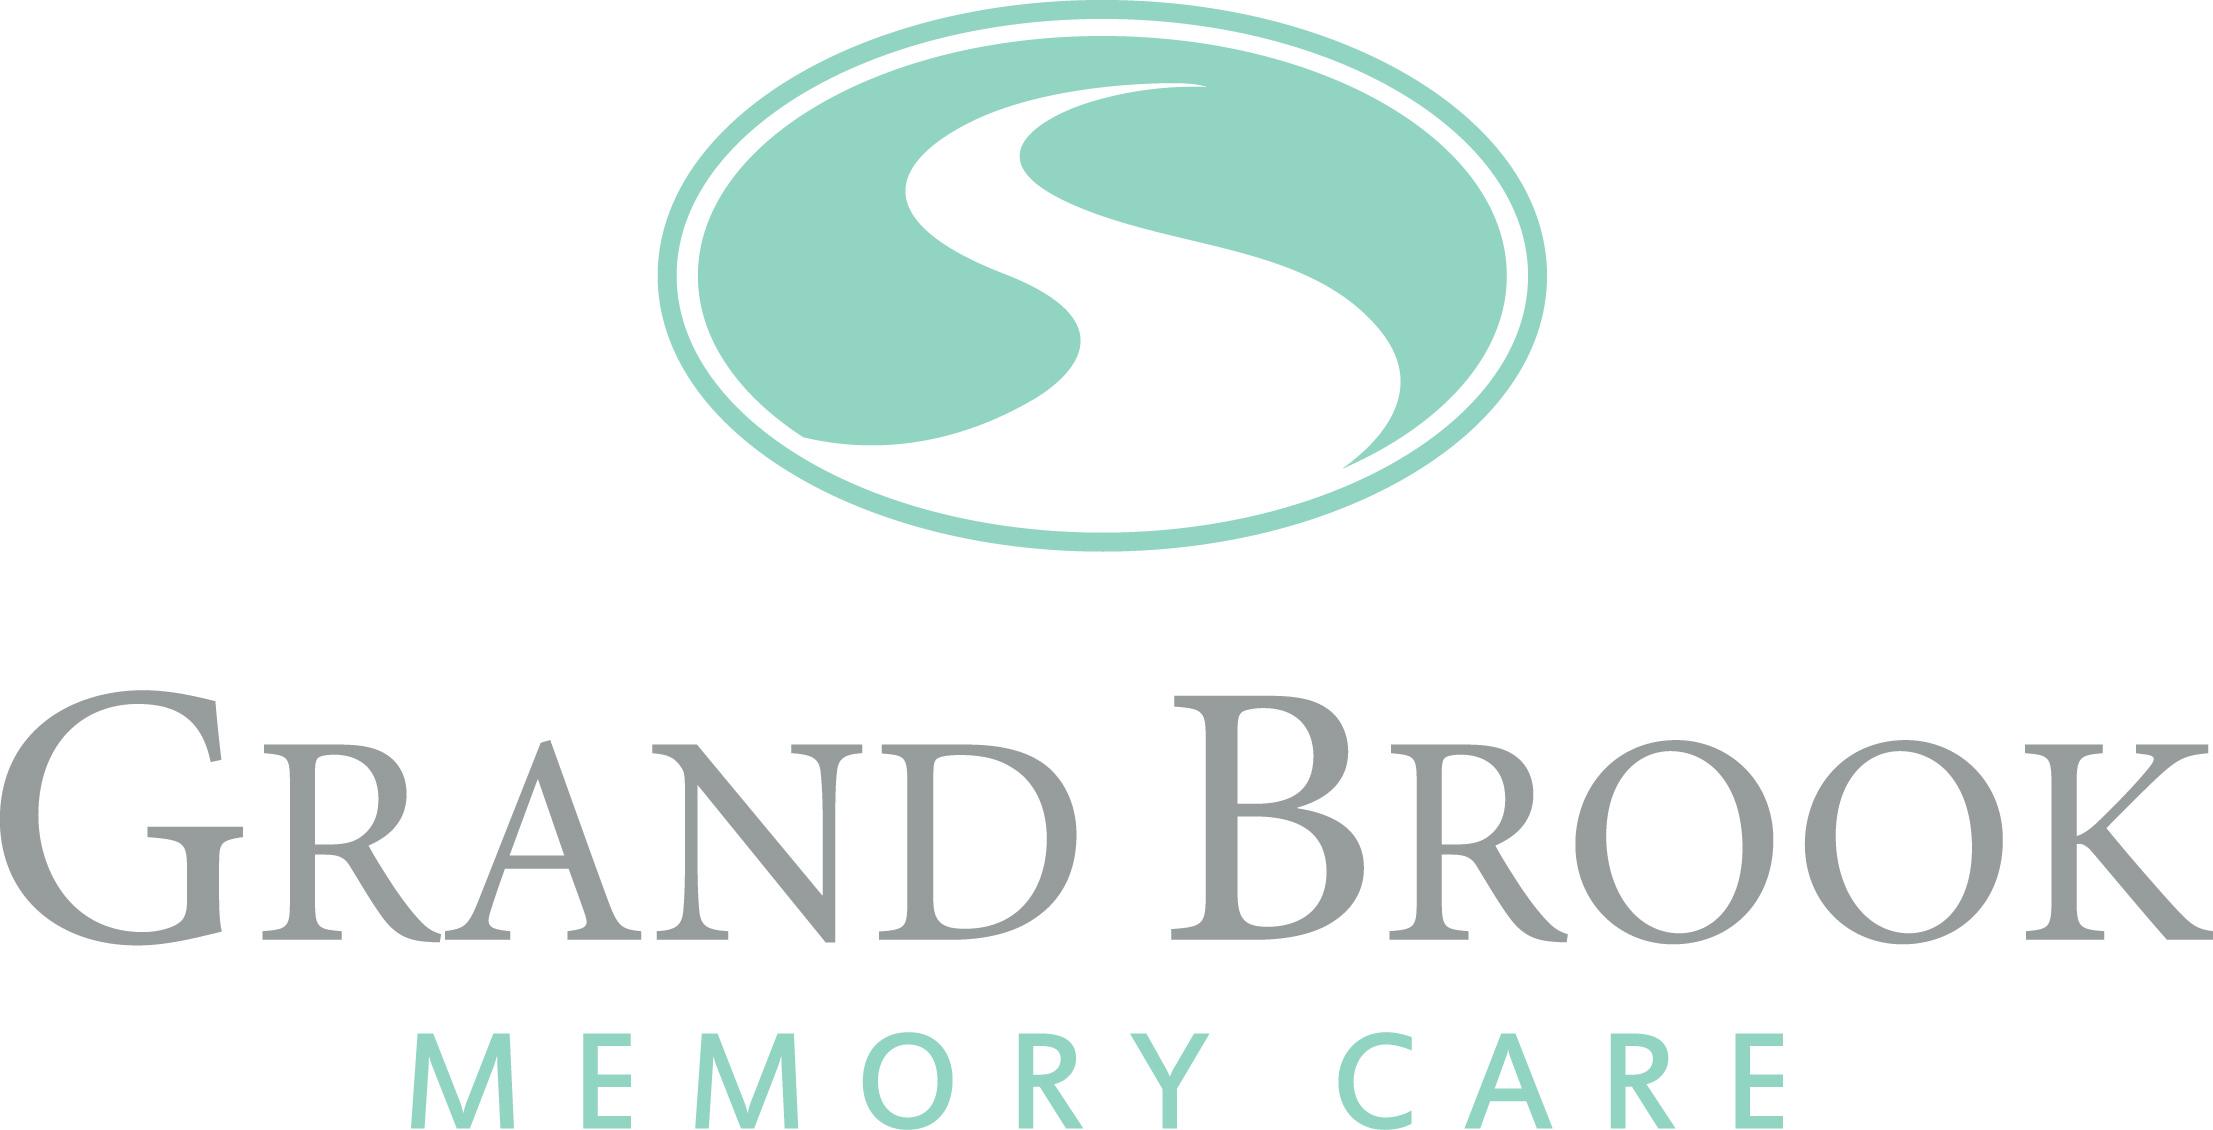 Stoneybrook Memory Care - Logo